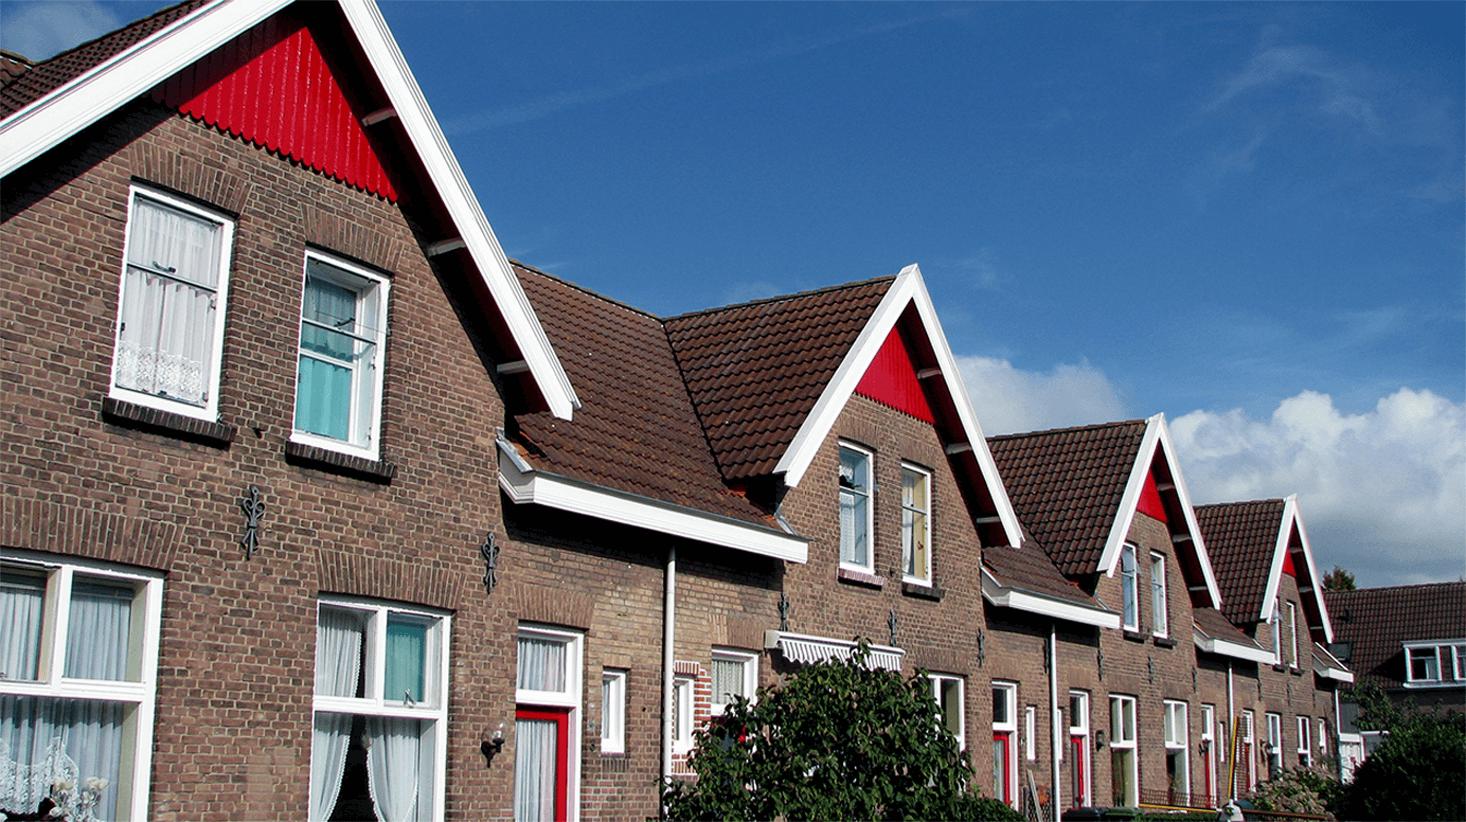 Verkoop - Dutch to English Translation